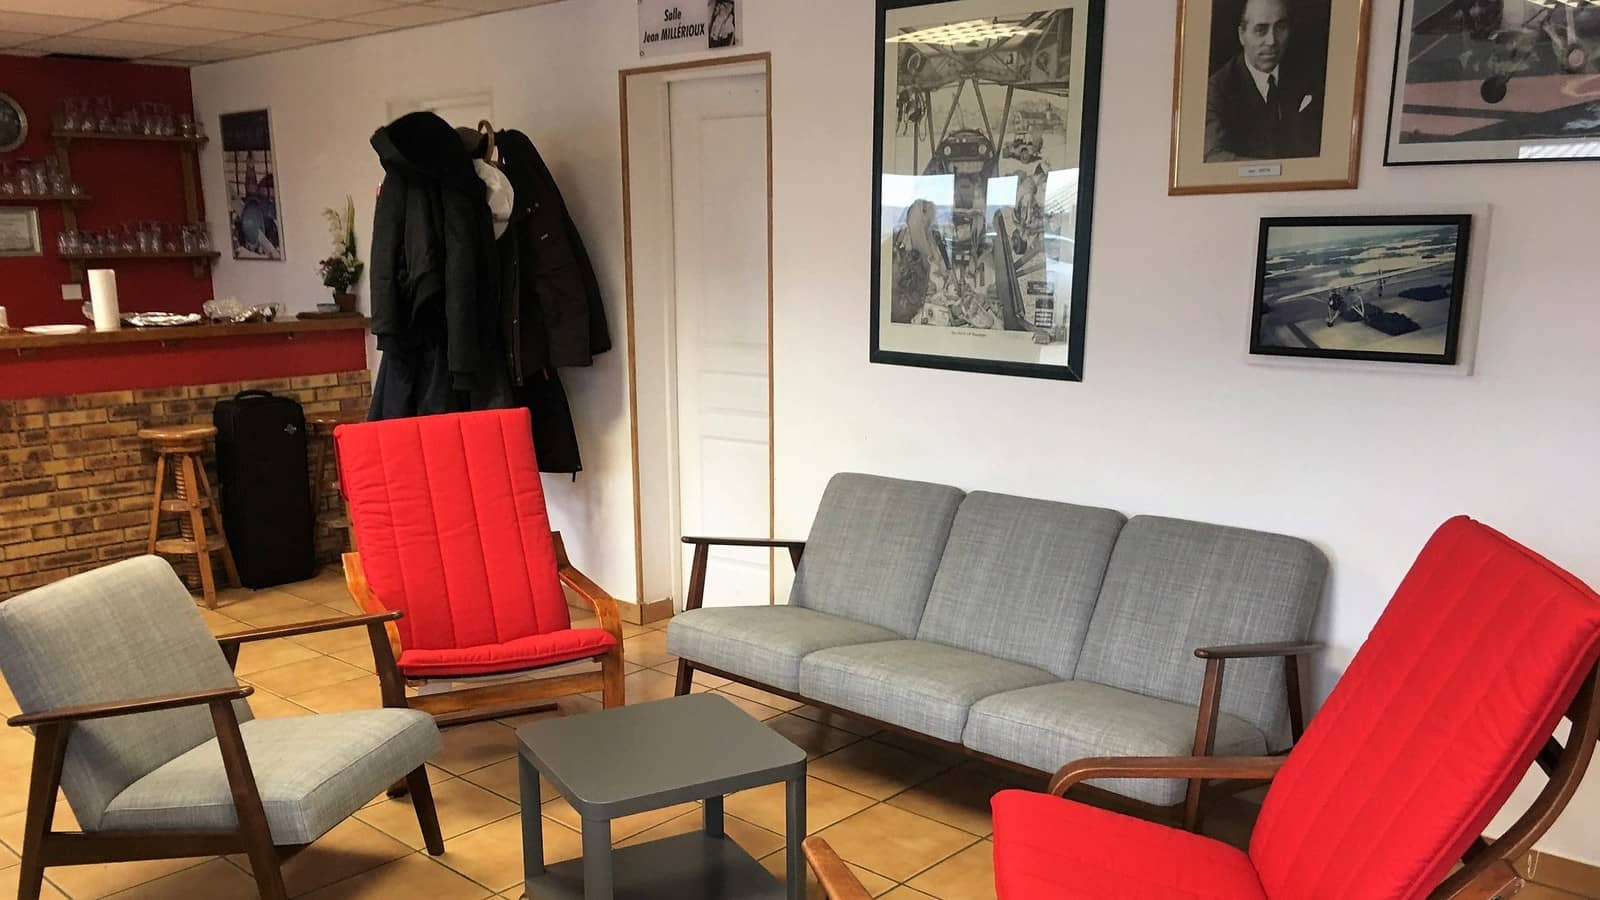 Le club house de l'aéroclub Jean Bertin